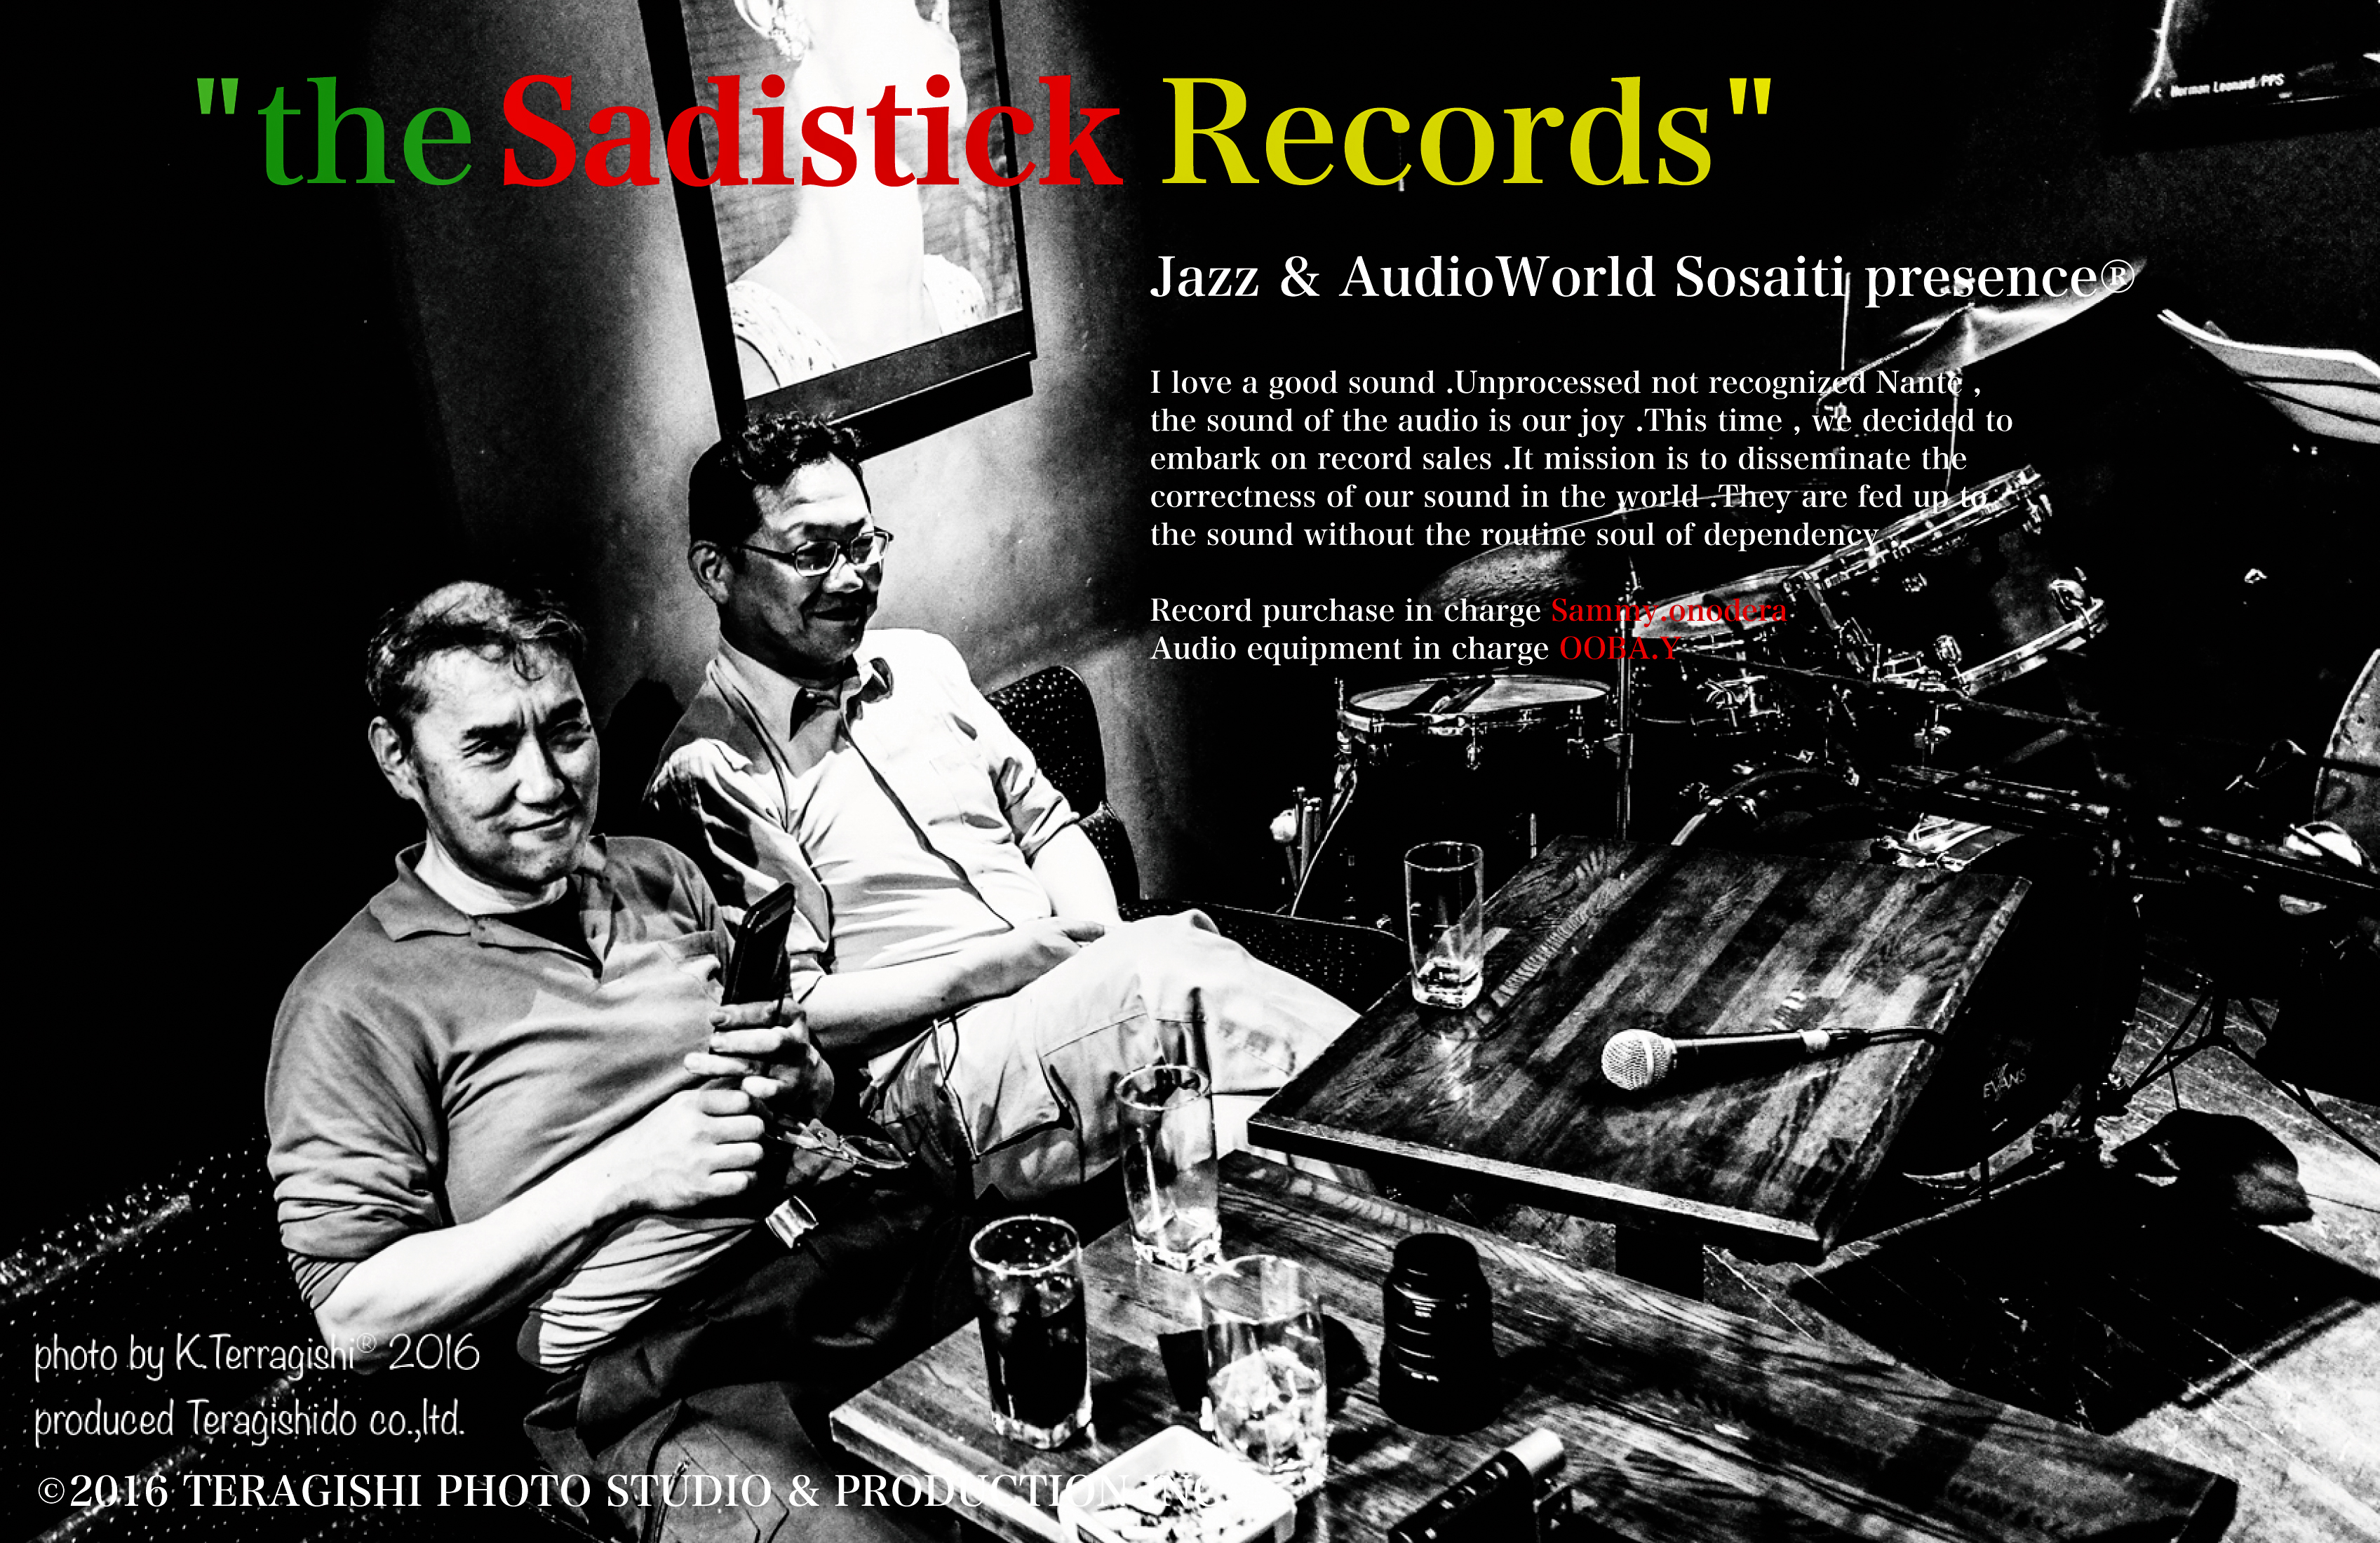 Sadistick Record